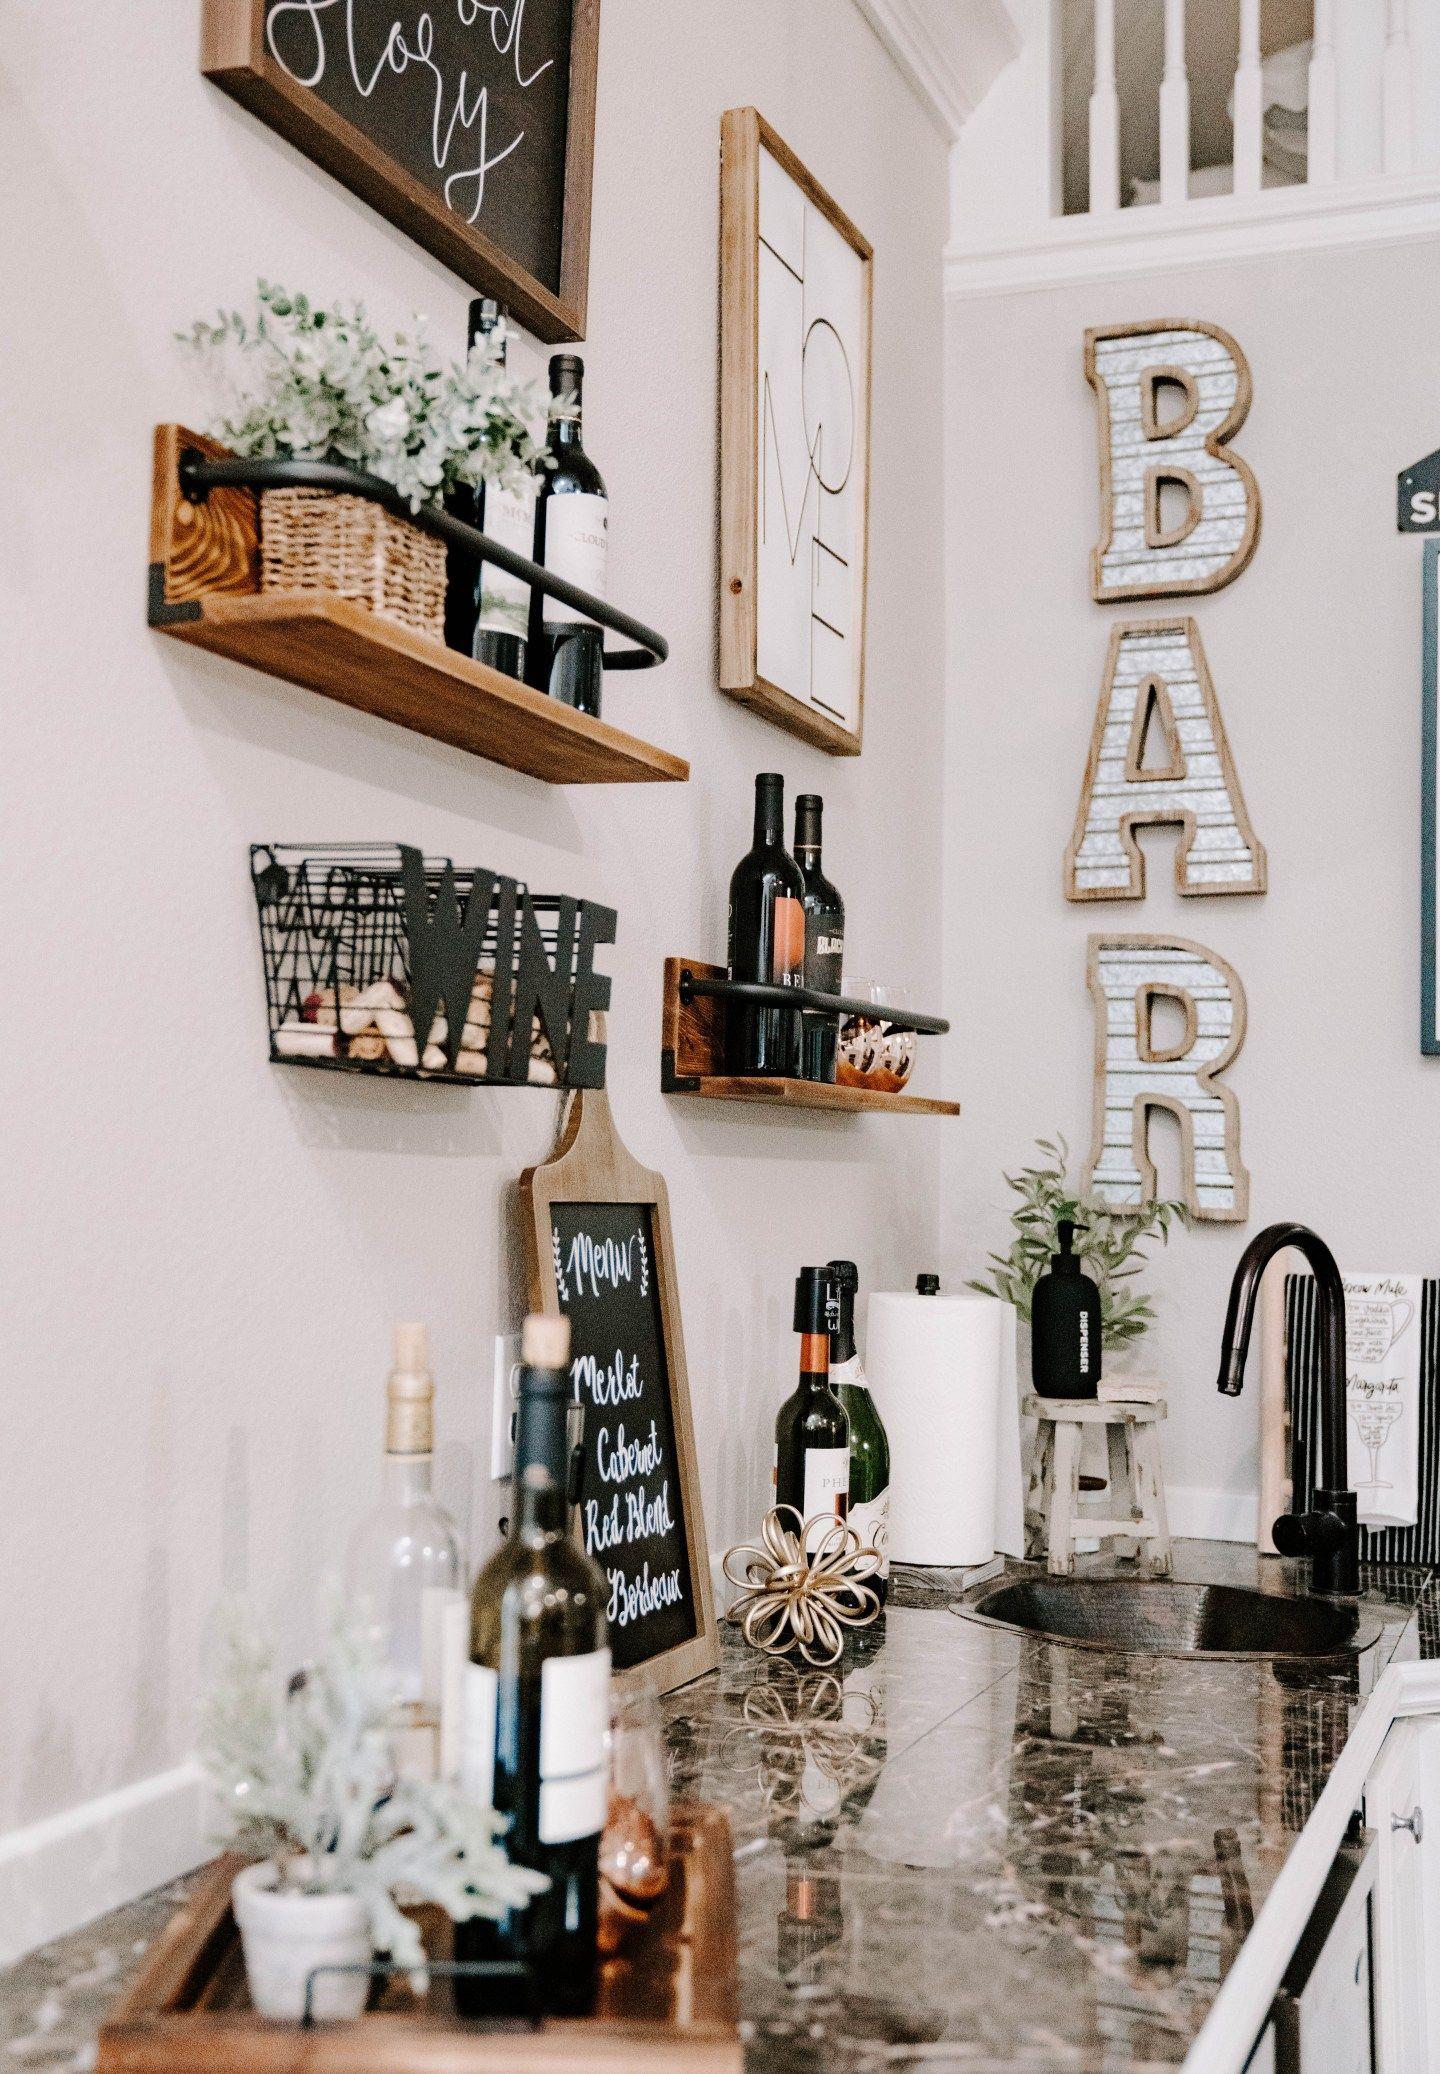 Home Bar Decor Ideas   xolivi   Bar wall decor, Home bar decor ...